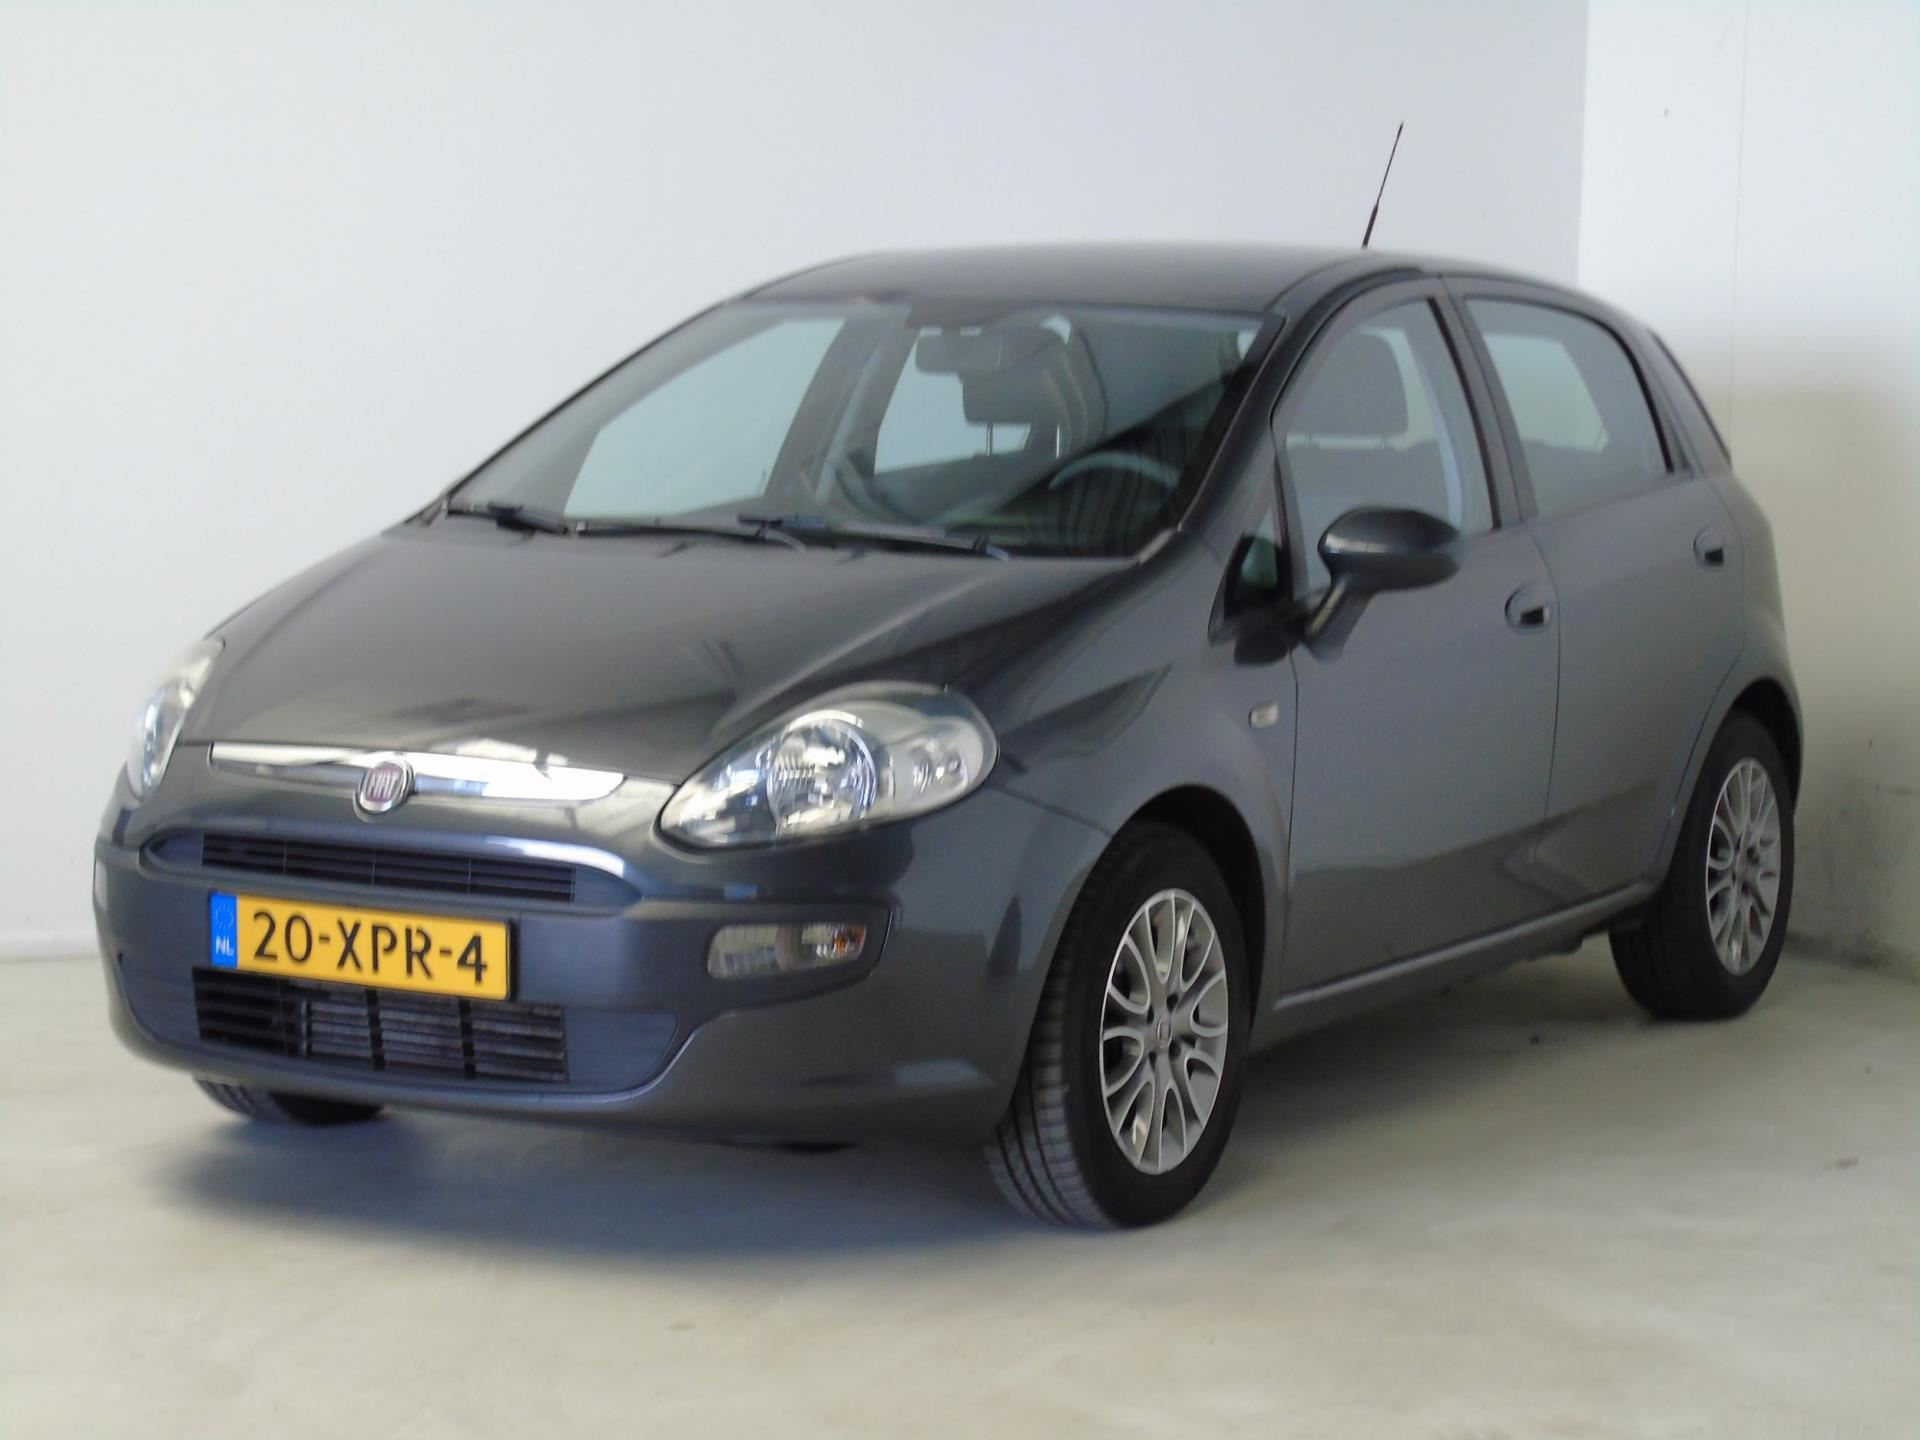 Fiat Punto Evo occasion - van Dijk auto's